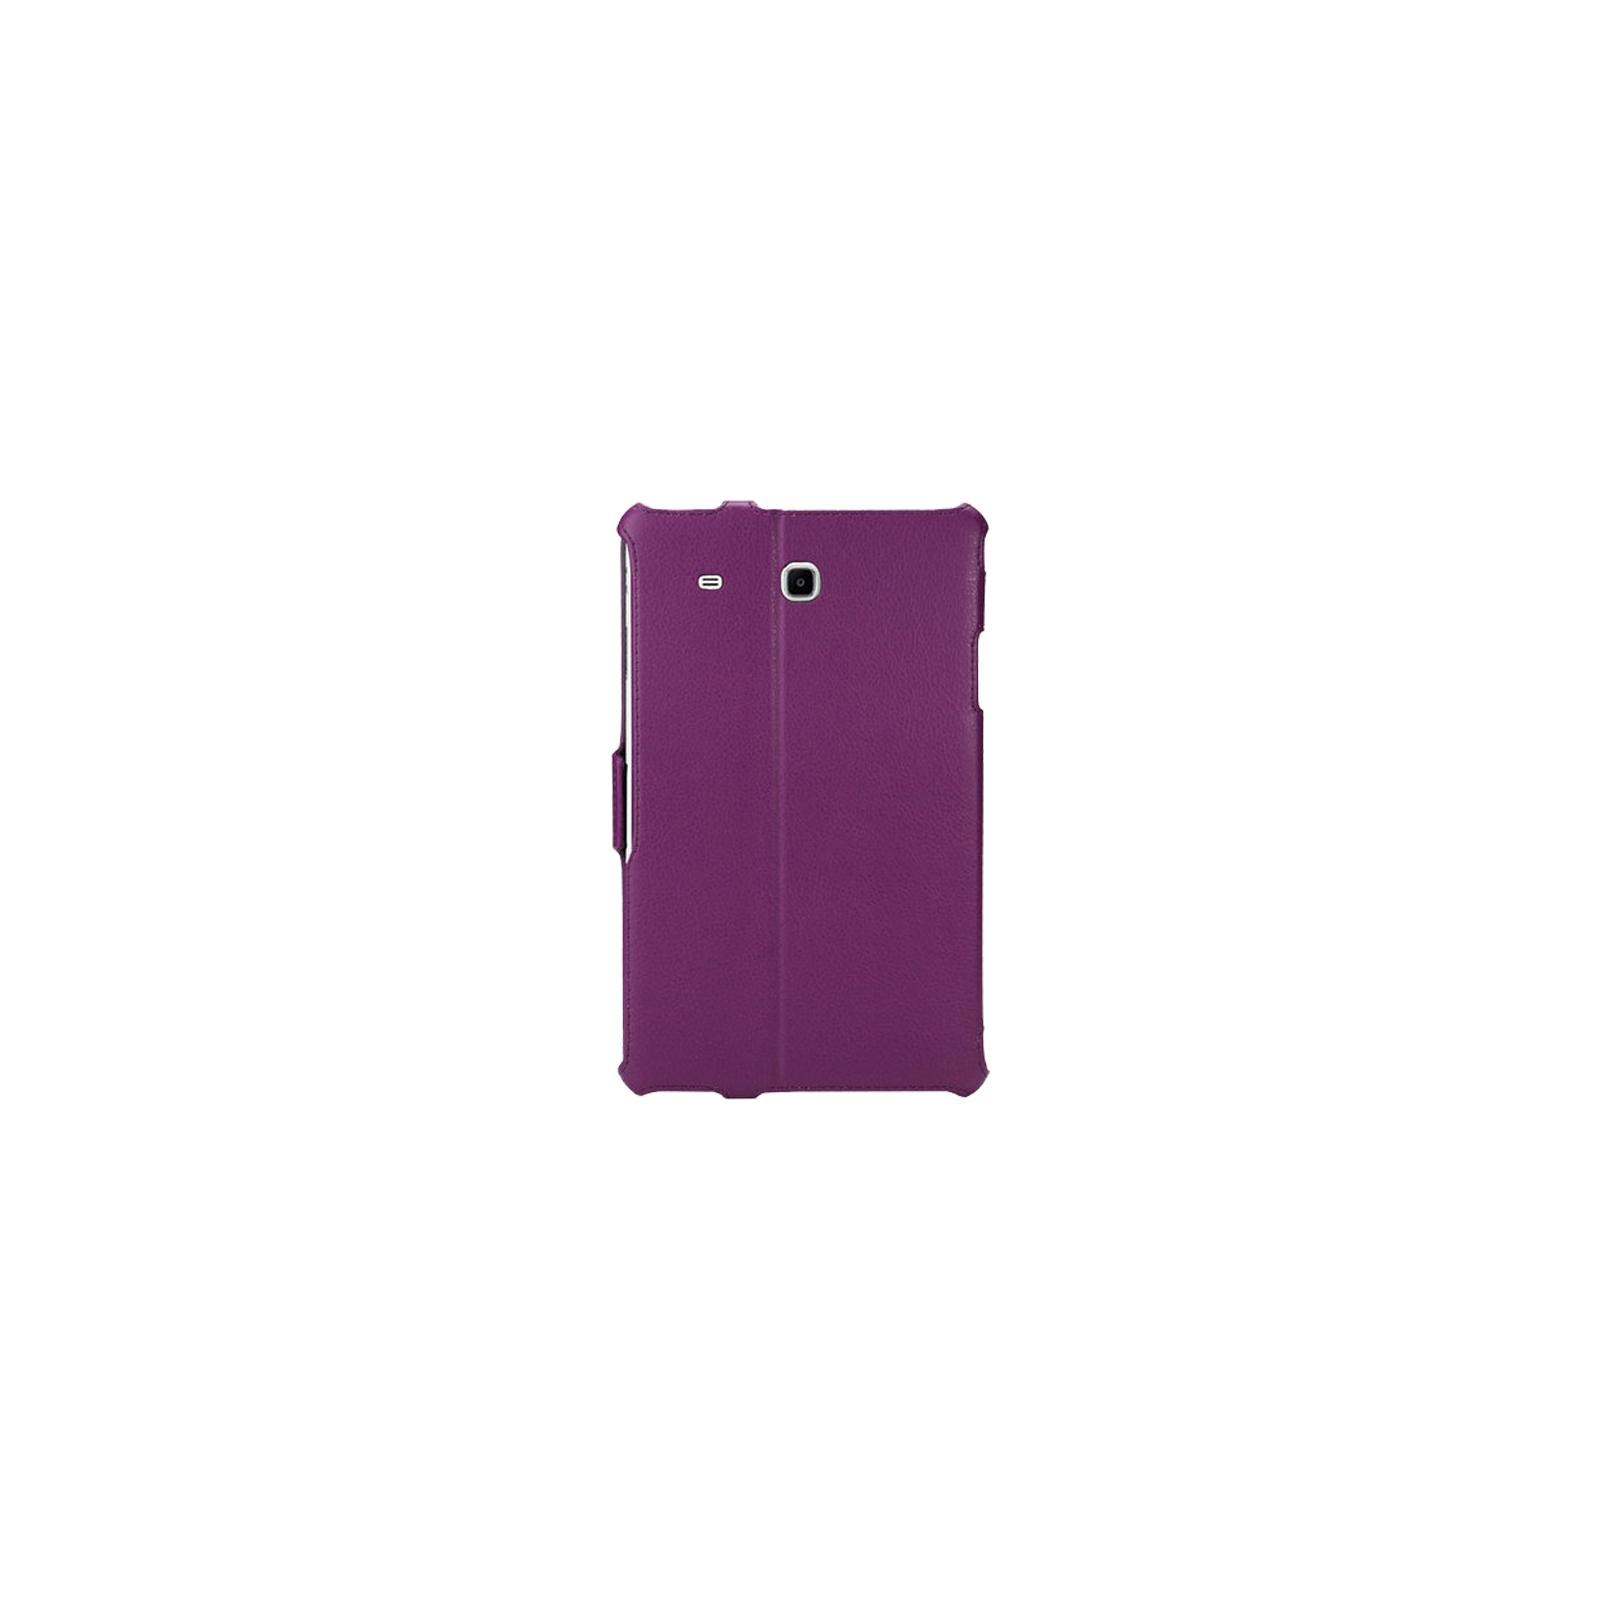 Чехол для планшета AirOn для Samsung Galaxy Tab E 9.6 vio (4822352776329) изображение 2